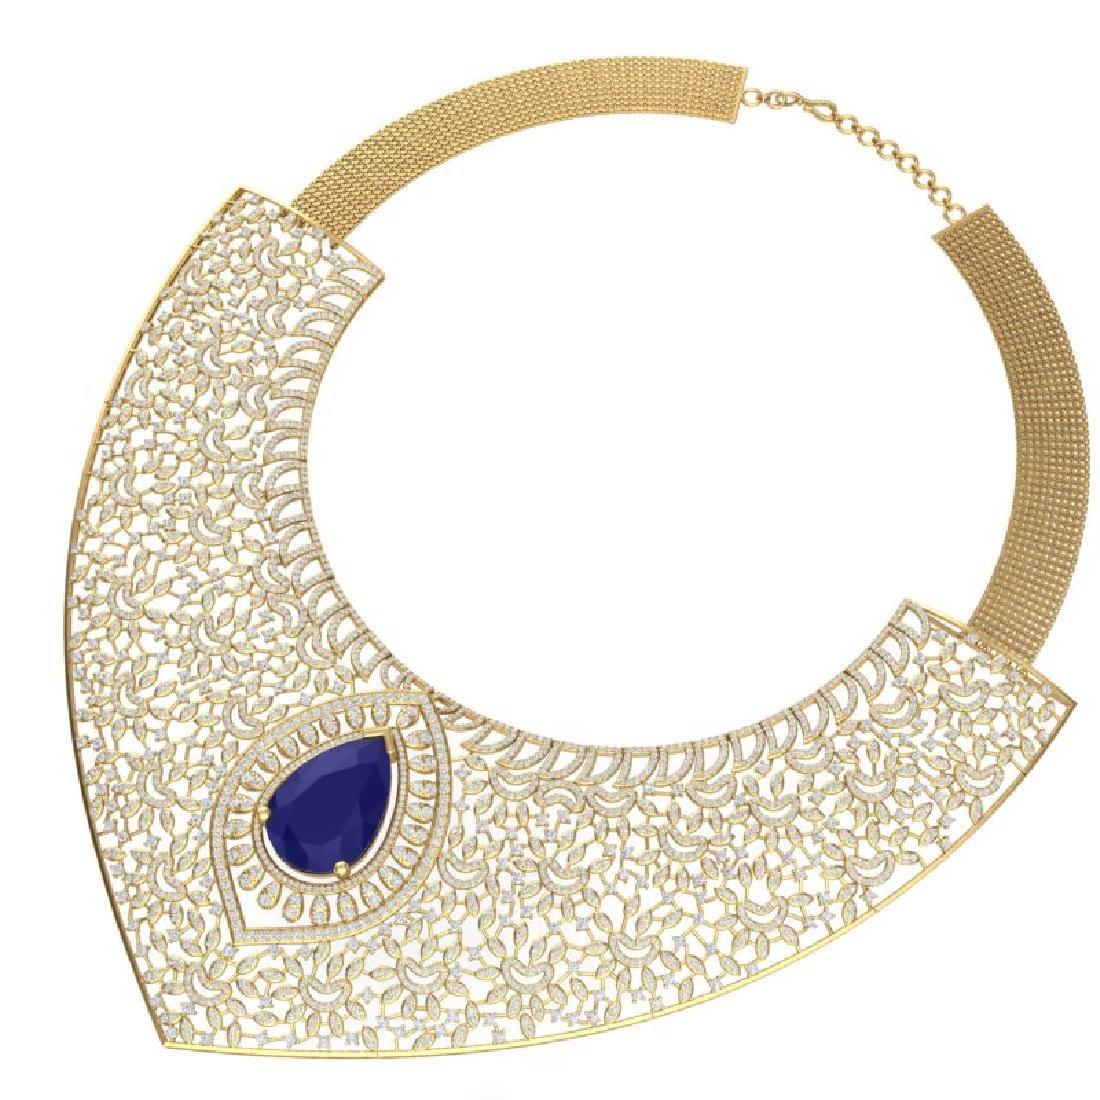 63.93 CTW Royalty Sapphire & VS Diamond Necklace 18K - 3